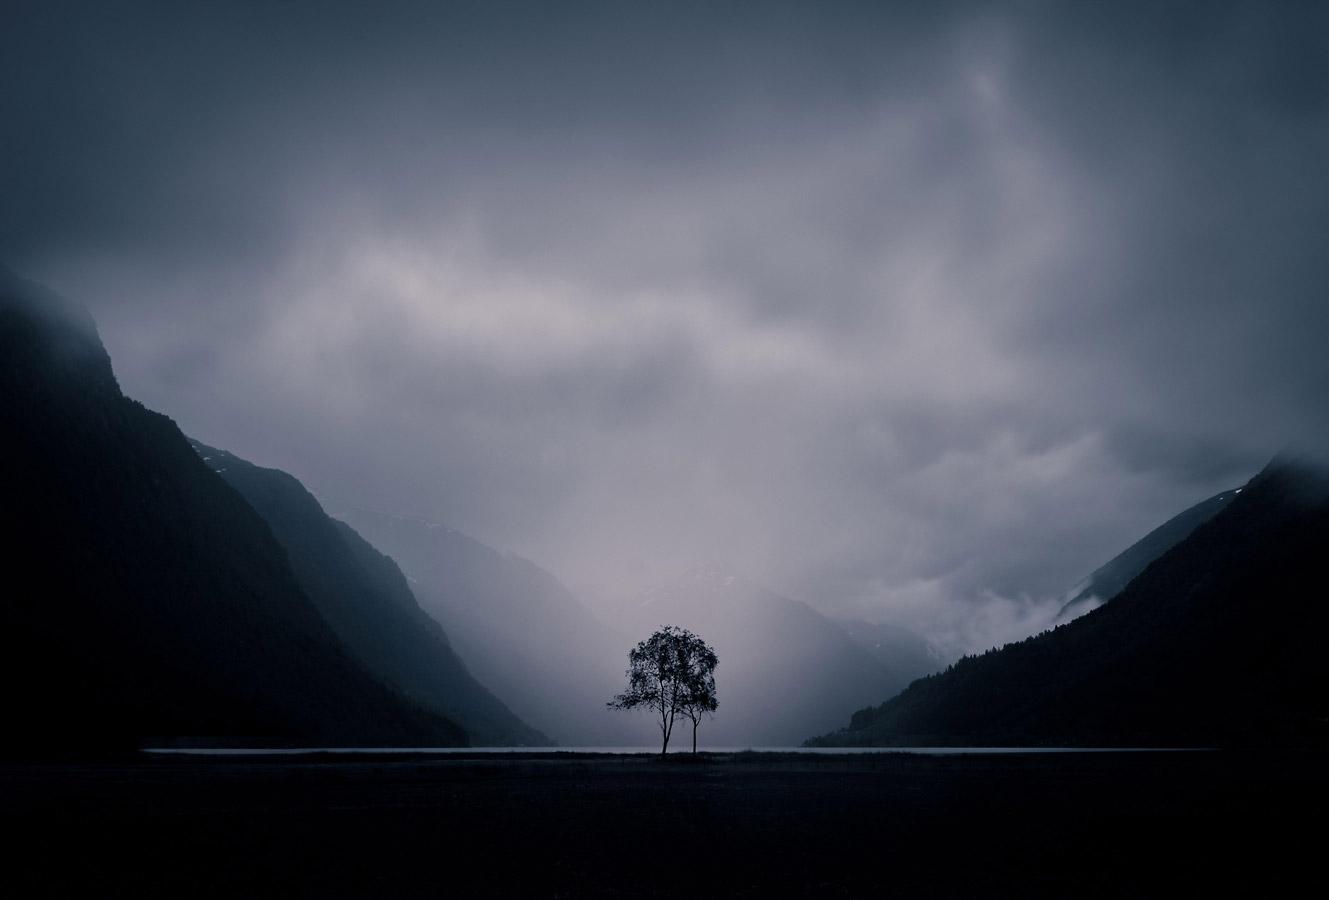 Дерево, © Павла Балькова, Природа, Фотоконкурс CEWE